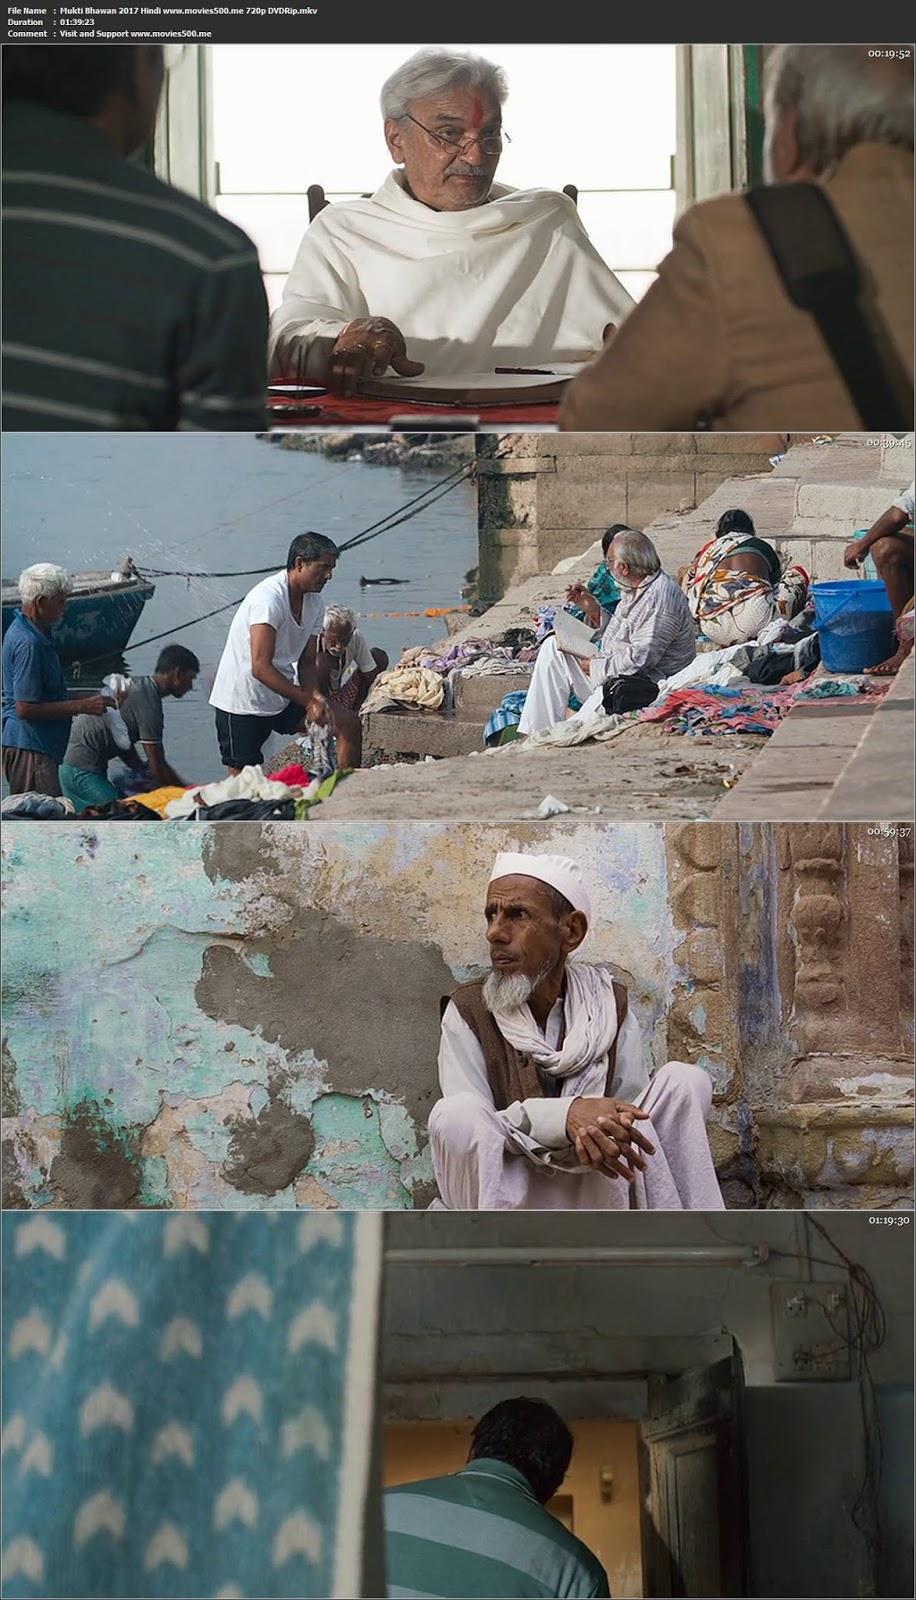 Mukti Bhawan 2017 Hindi Full Movie 900MB DVDRip 720p at freedomcopy.com